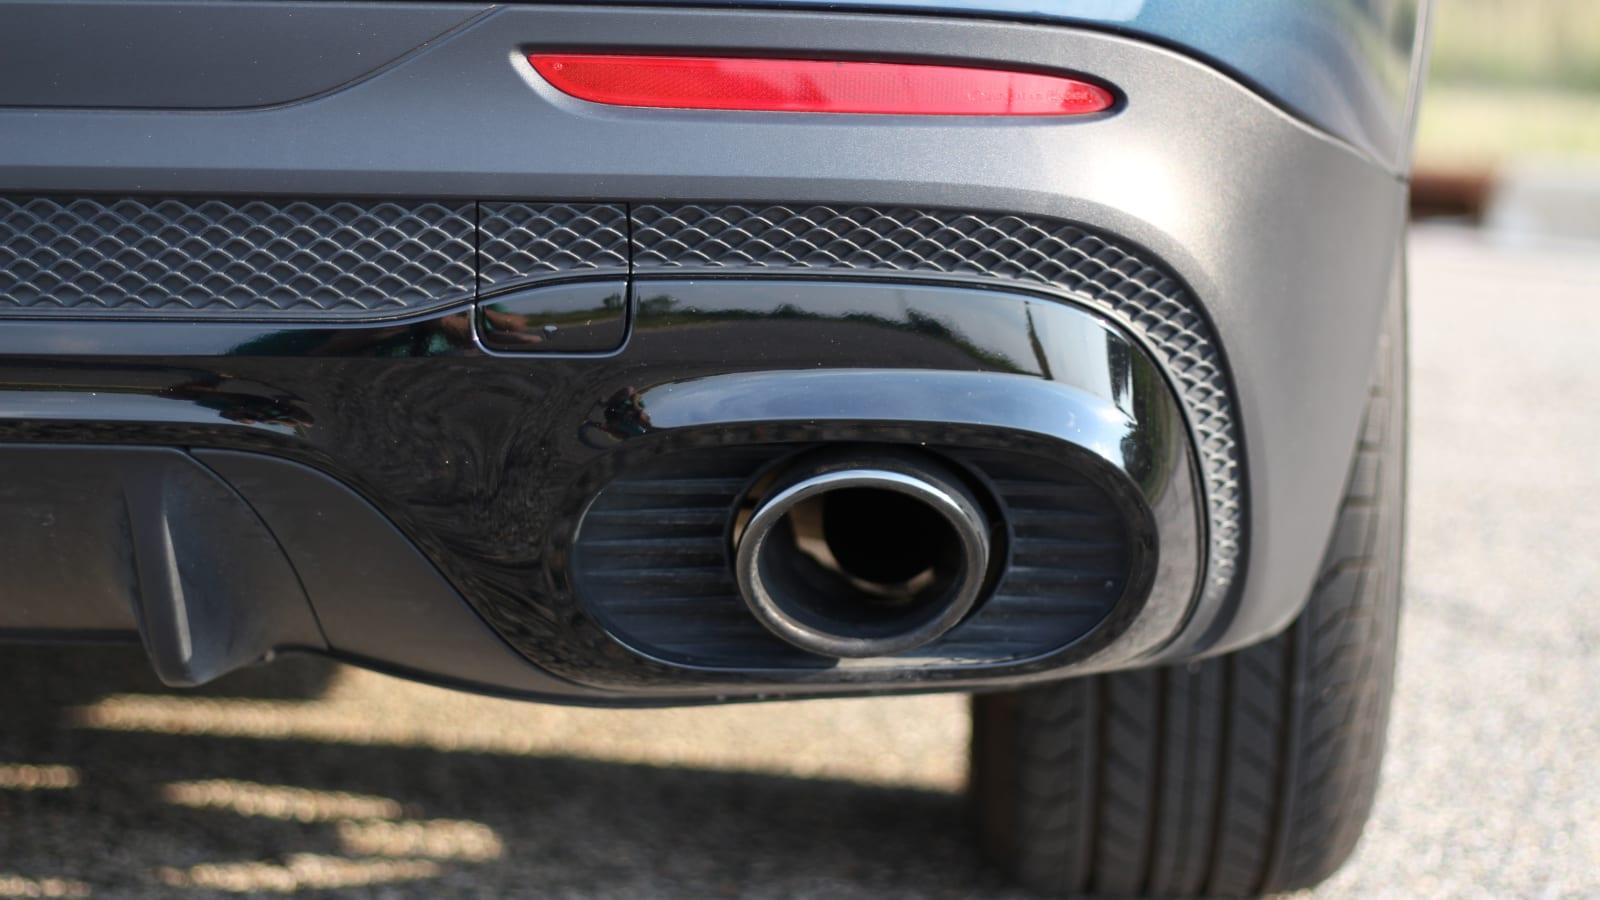 2021 Mercedes-AMG GLB 35 Fahrtest